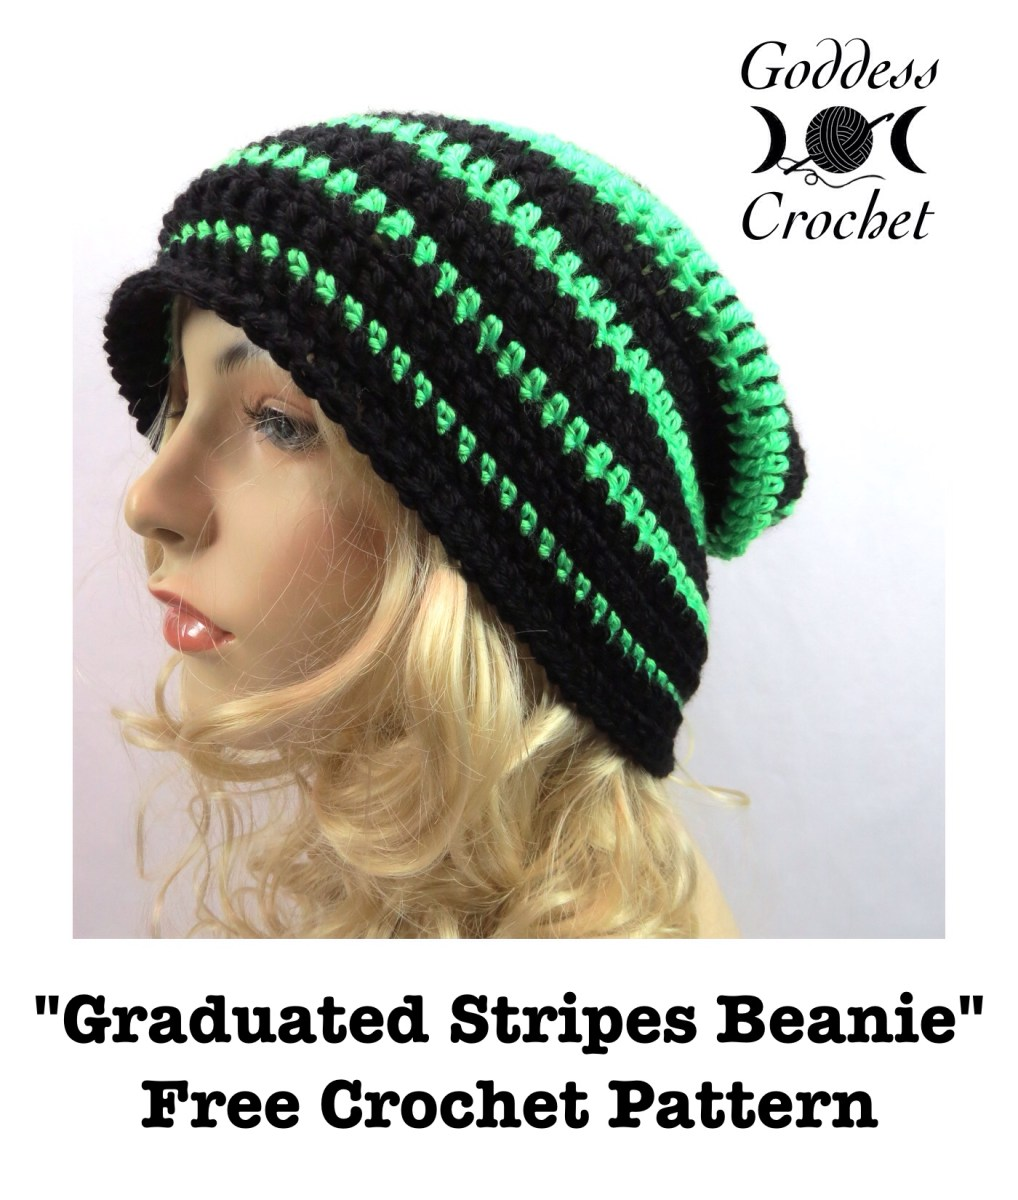 Free Crochet Pattern – Graduated Stripes Beanie – Goddess Crochet